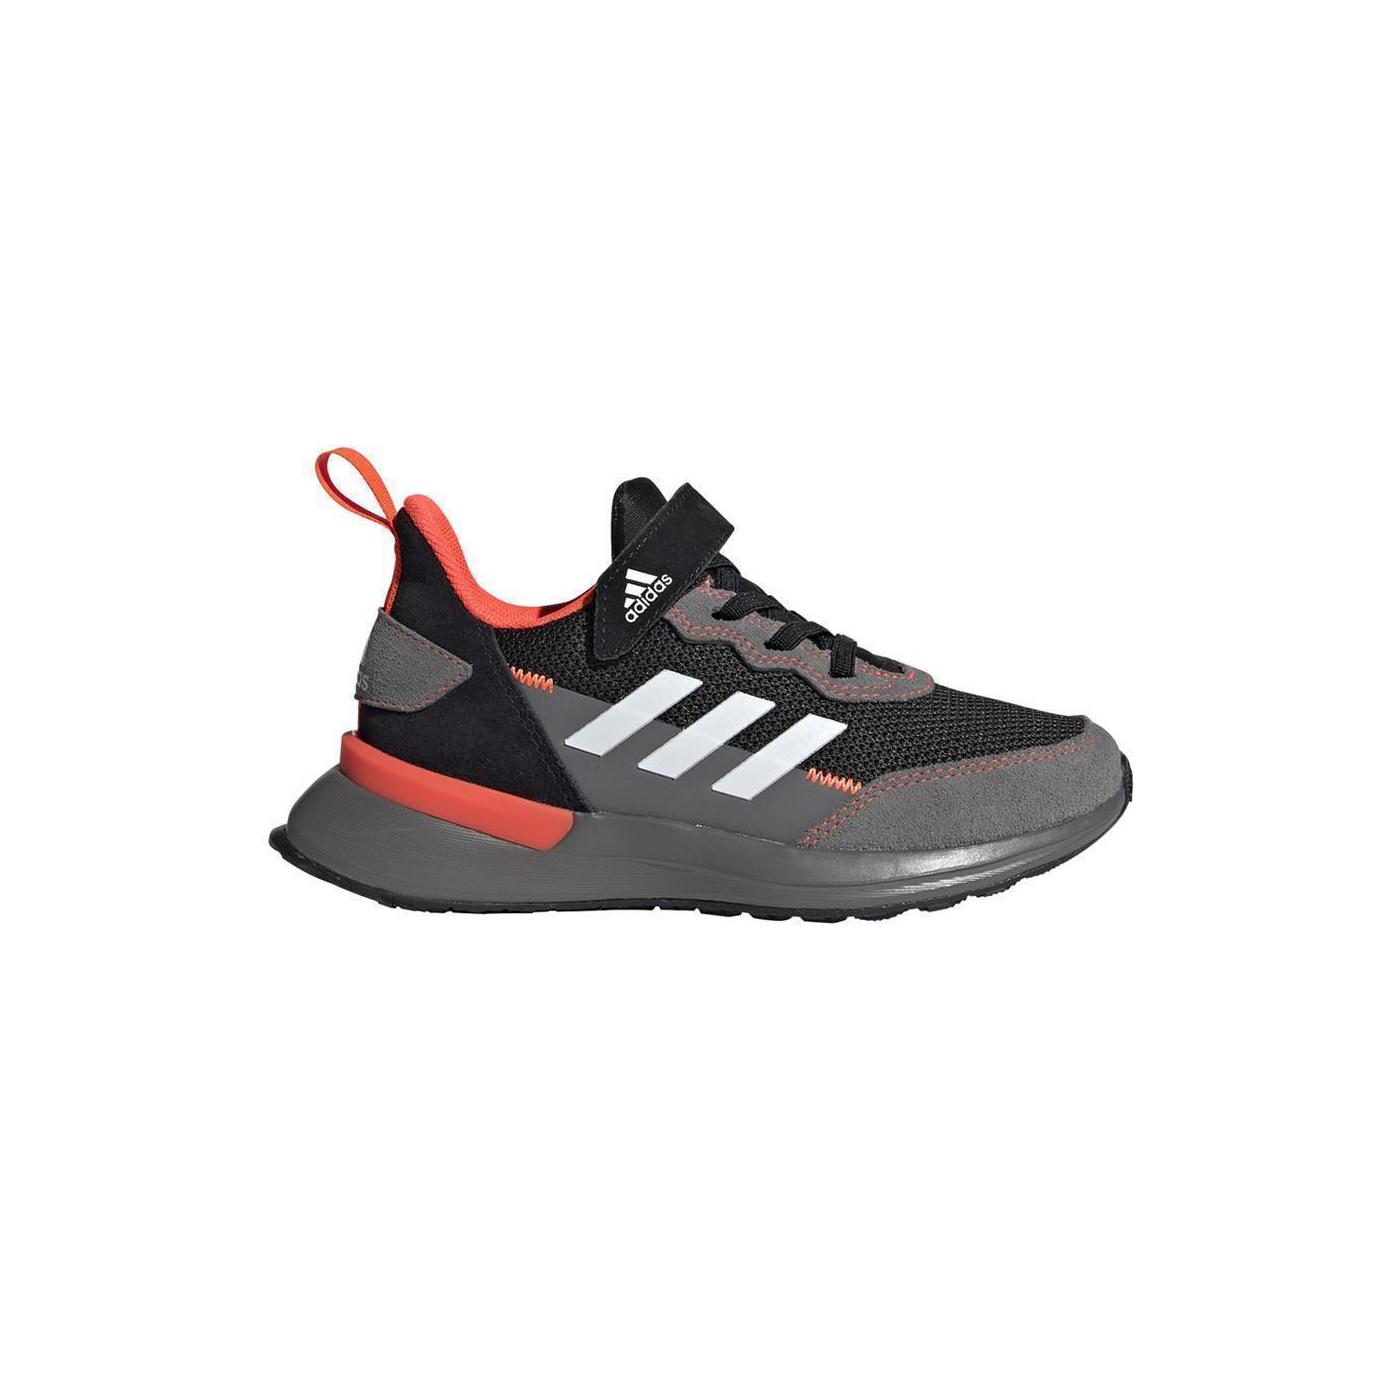 adidas RapidaRun Elite S&L EL K Laufschuhe Kinder - EF9413